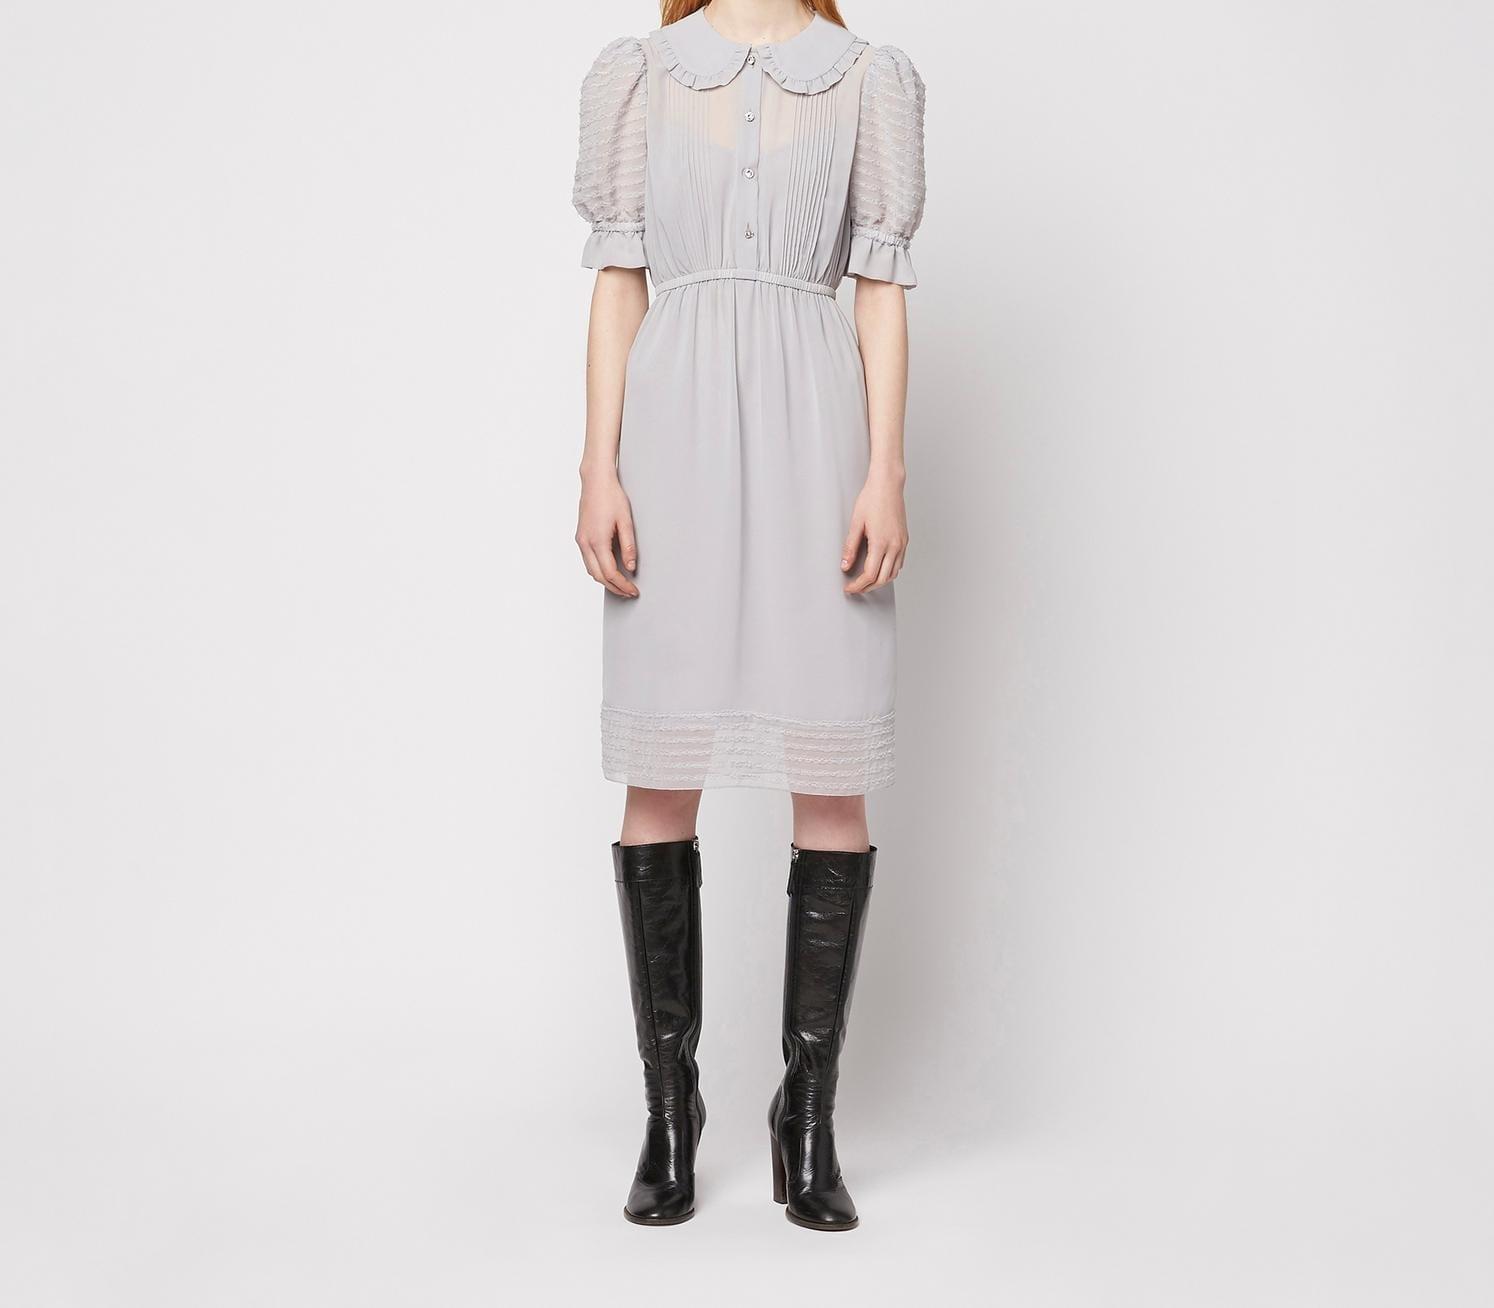 MARC JACOBS Kat Dress